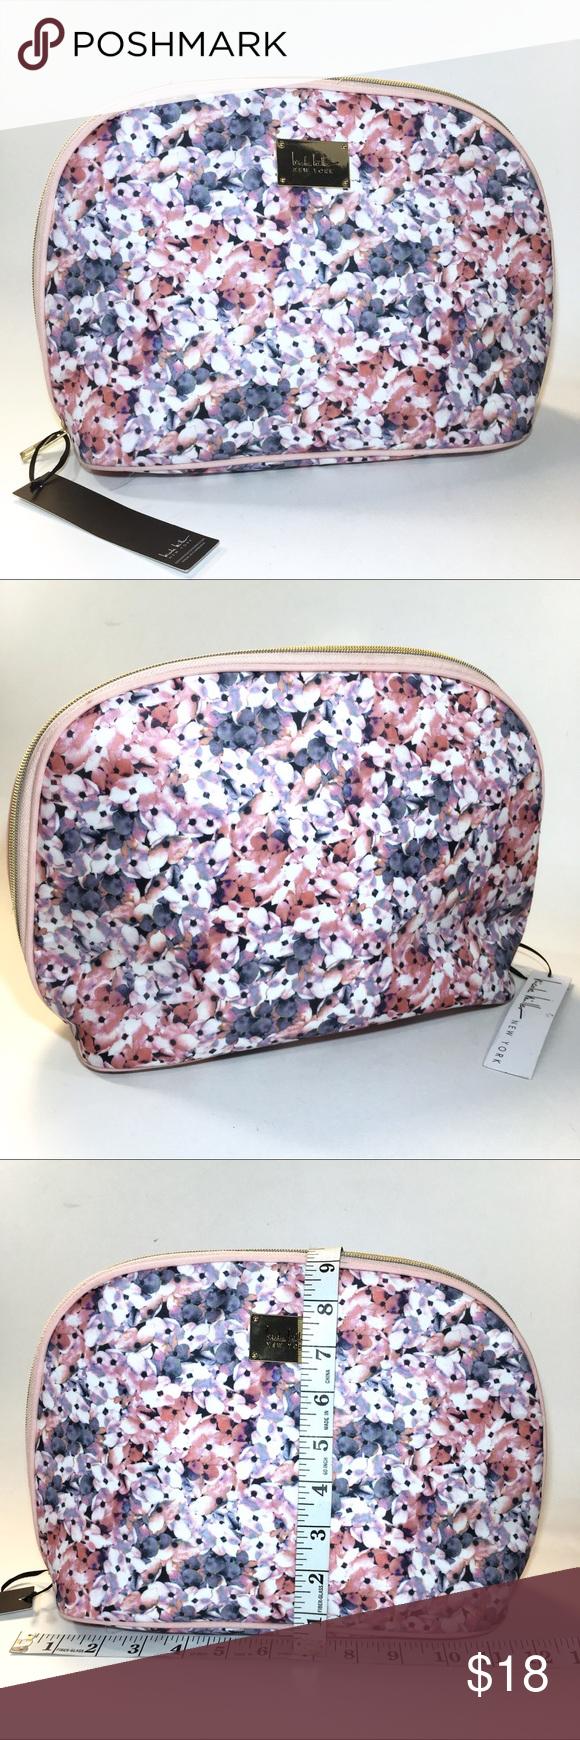 Nicole Miller NEW YORK Floral Makeup Bag Pink Wht NWT